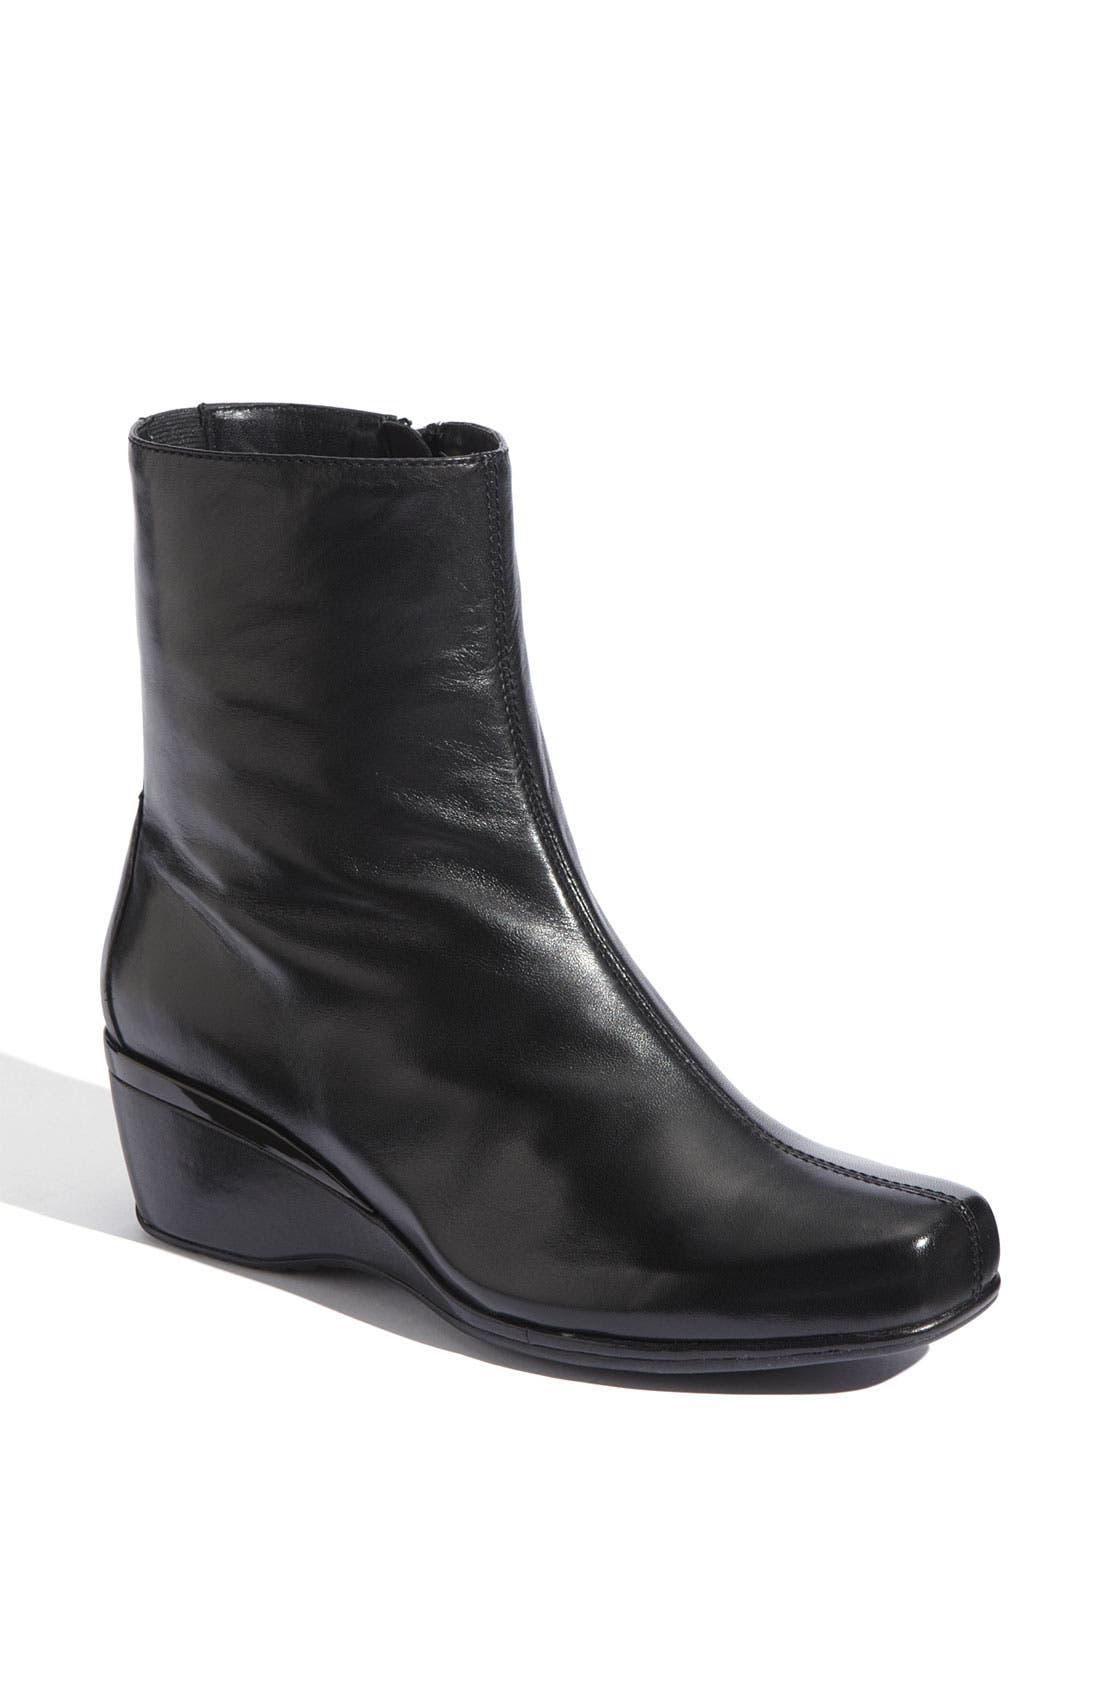 Alternate Image 1 Selected - Aetrex 'Carolyn Essence' Boot